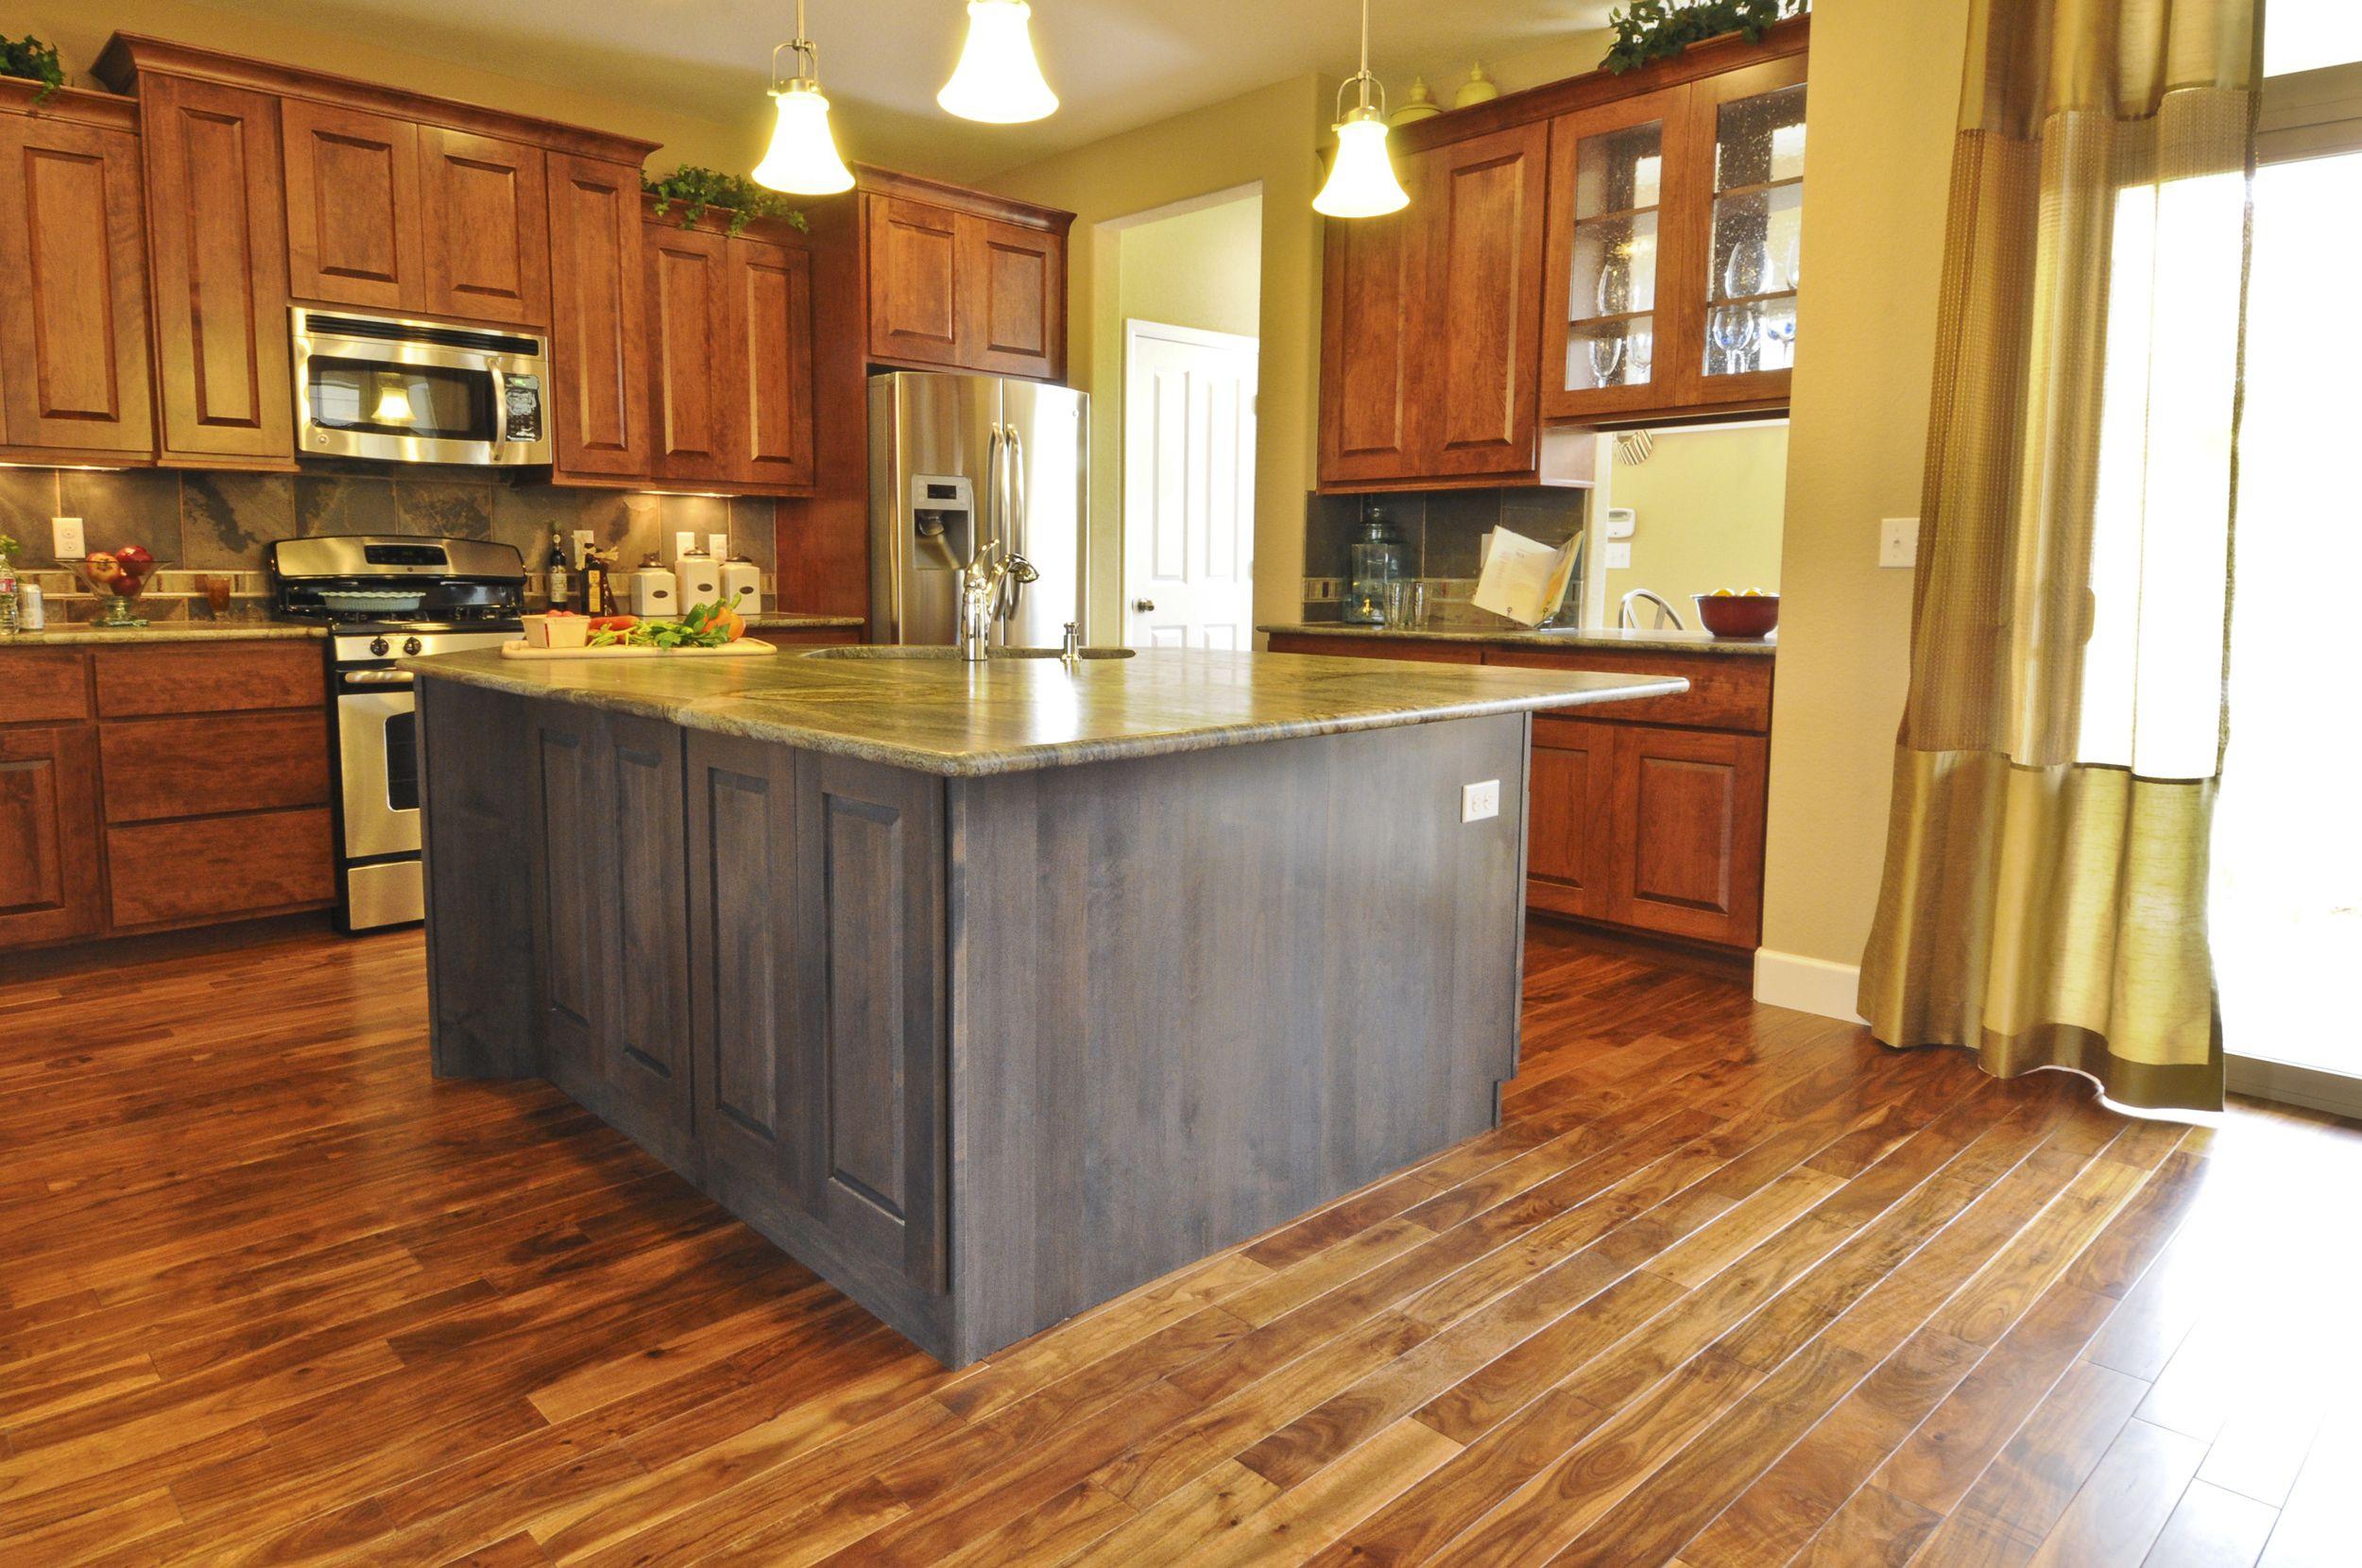 kentwood hardwood flooring prices of hardwood floor refinishing richmond va kentwood acacia natural with hardwood floor refinishing richmond va kentwood acacia natural flooring ideas pinterest